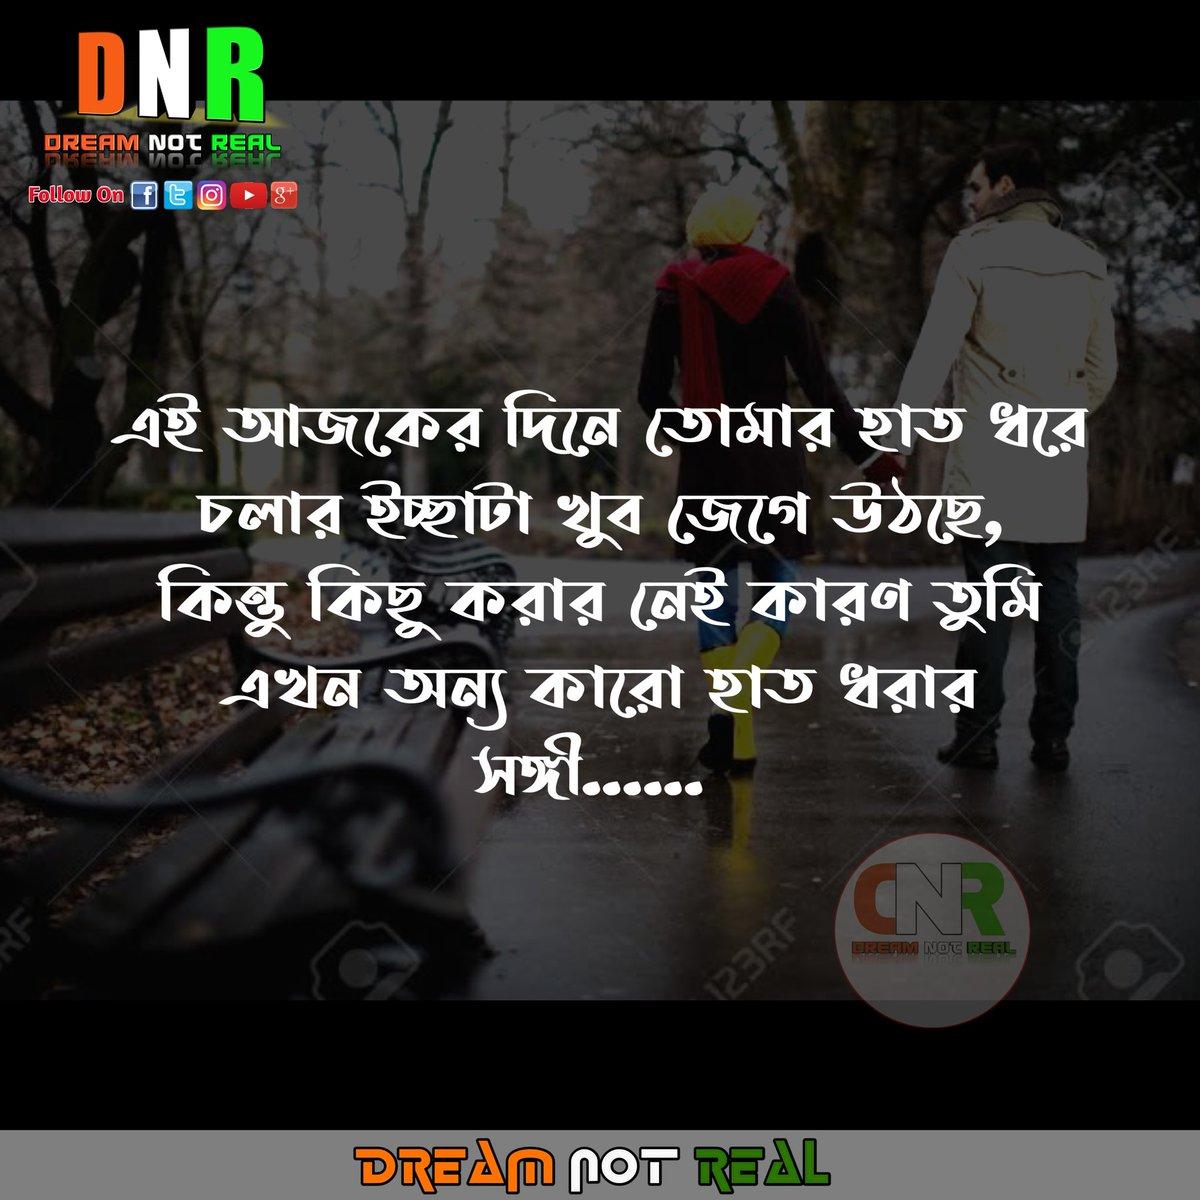 DreamNotReal #ইচ্ছা #dream #dream_not_real